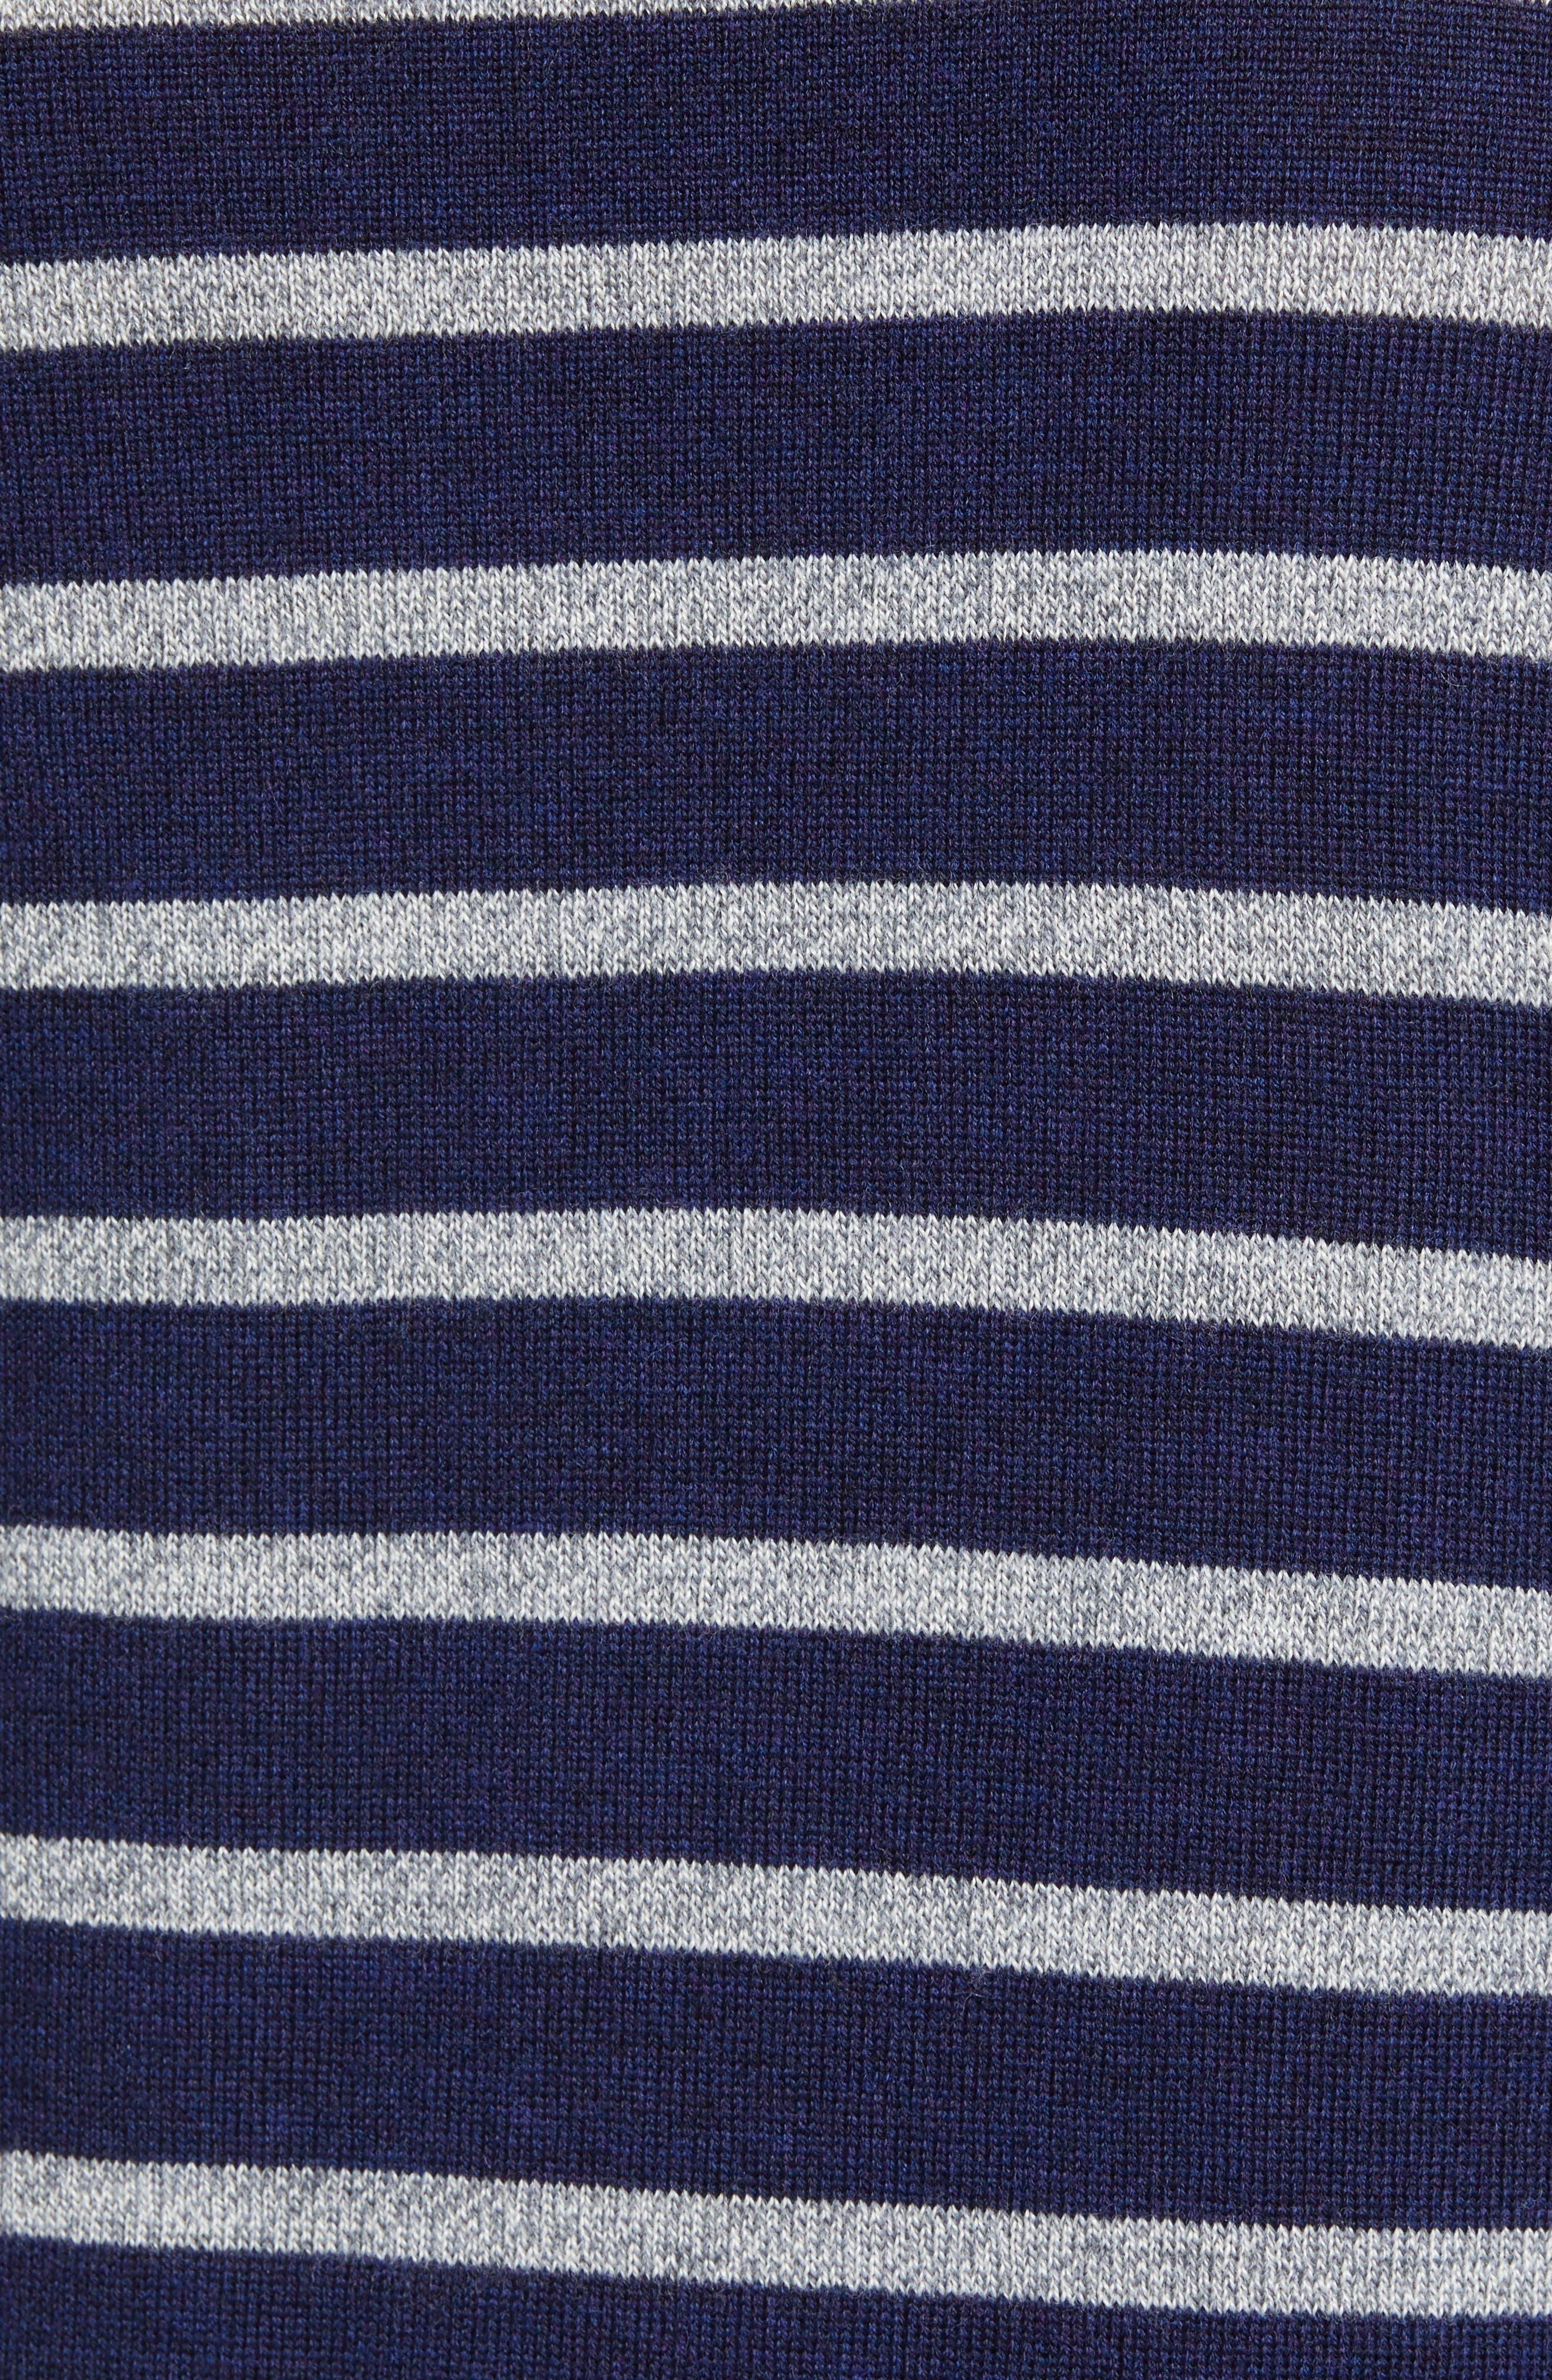 Slim Fit Turtleneck Merino Wool Sweater,                             Alternate thumbnail 5, color,                             HEATHER INK/ COOL GREY